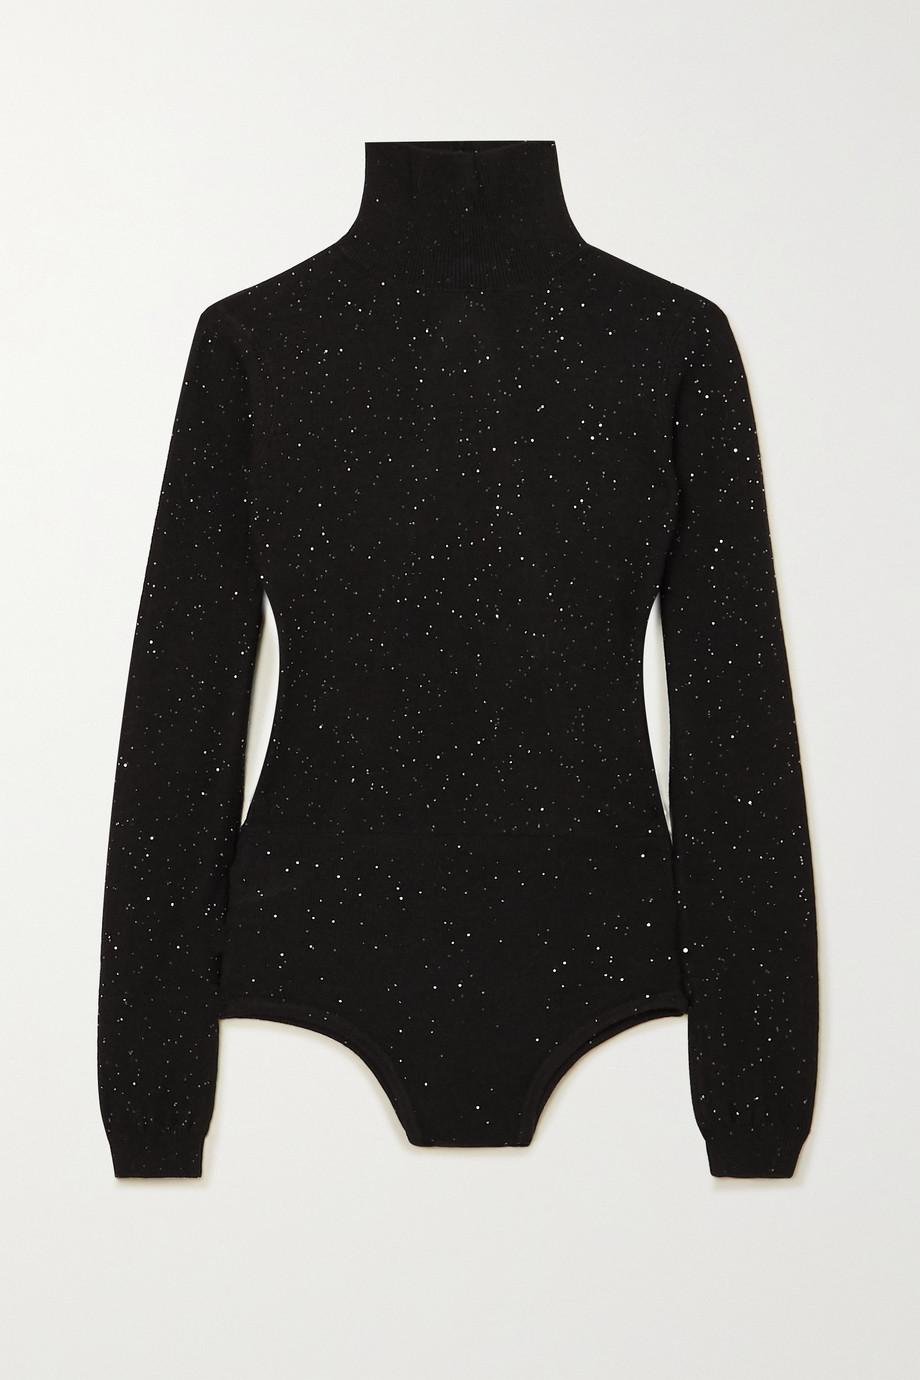 AREA Open-back sequined wool-blend turtleneck bodysuit